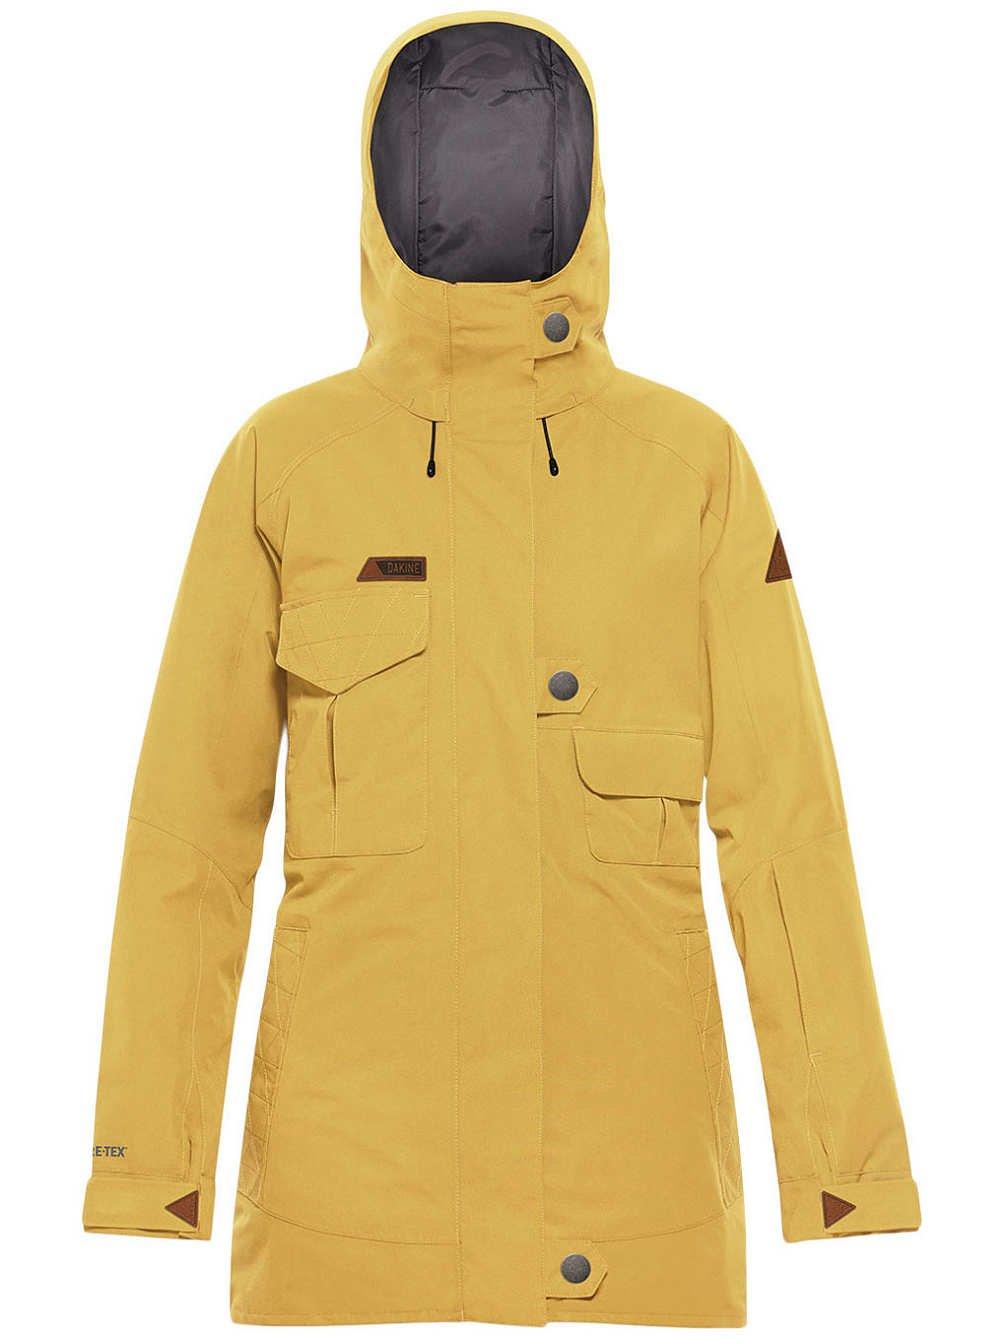 Damen Snowboard Jacke Dakine Linnton Jacket jetzt bestellen